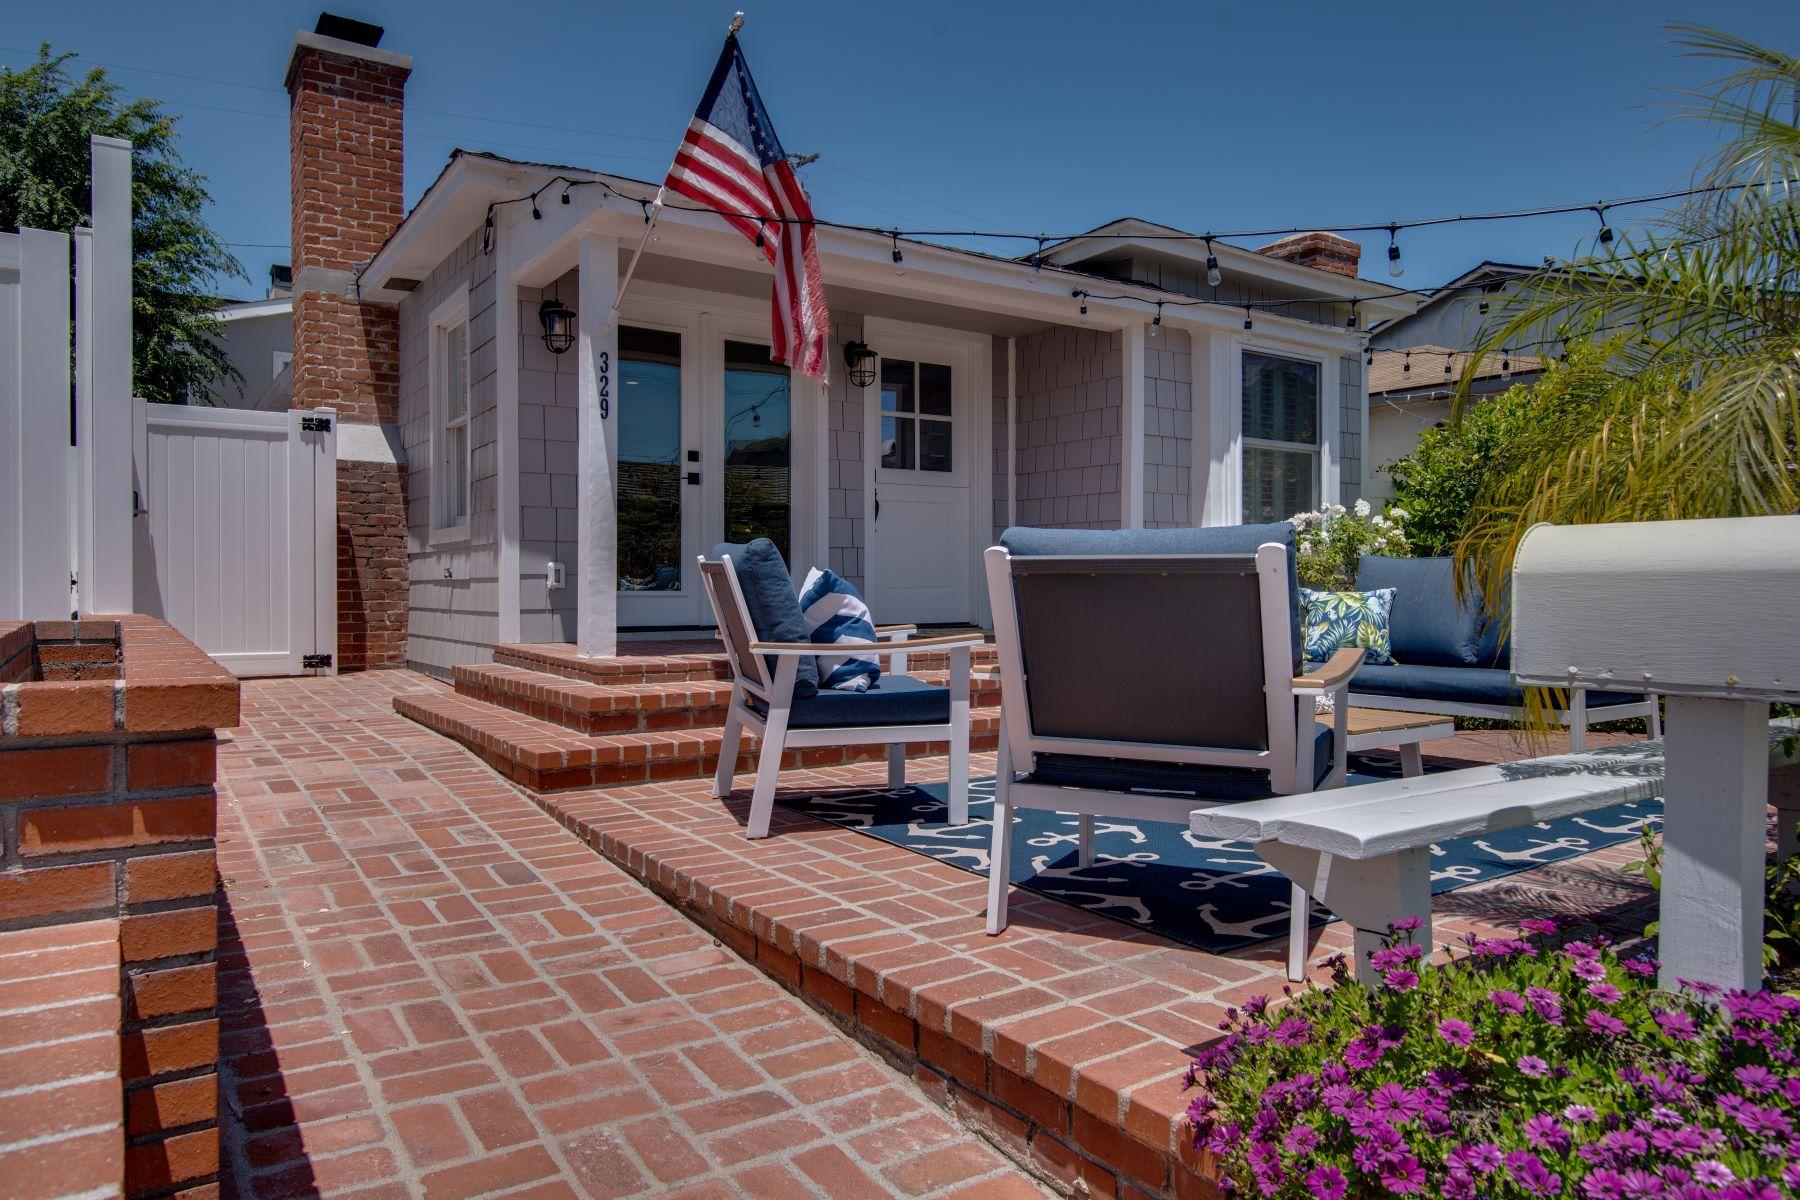 Single Family Homes por un Venta en 329 4th Street, Manhattan Beach, CA 90266 329 4th Street Manhattan Beach, California 90266 Estados Unidos